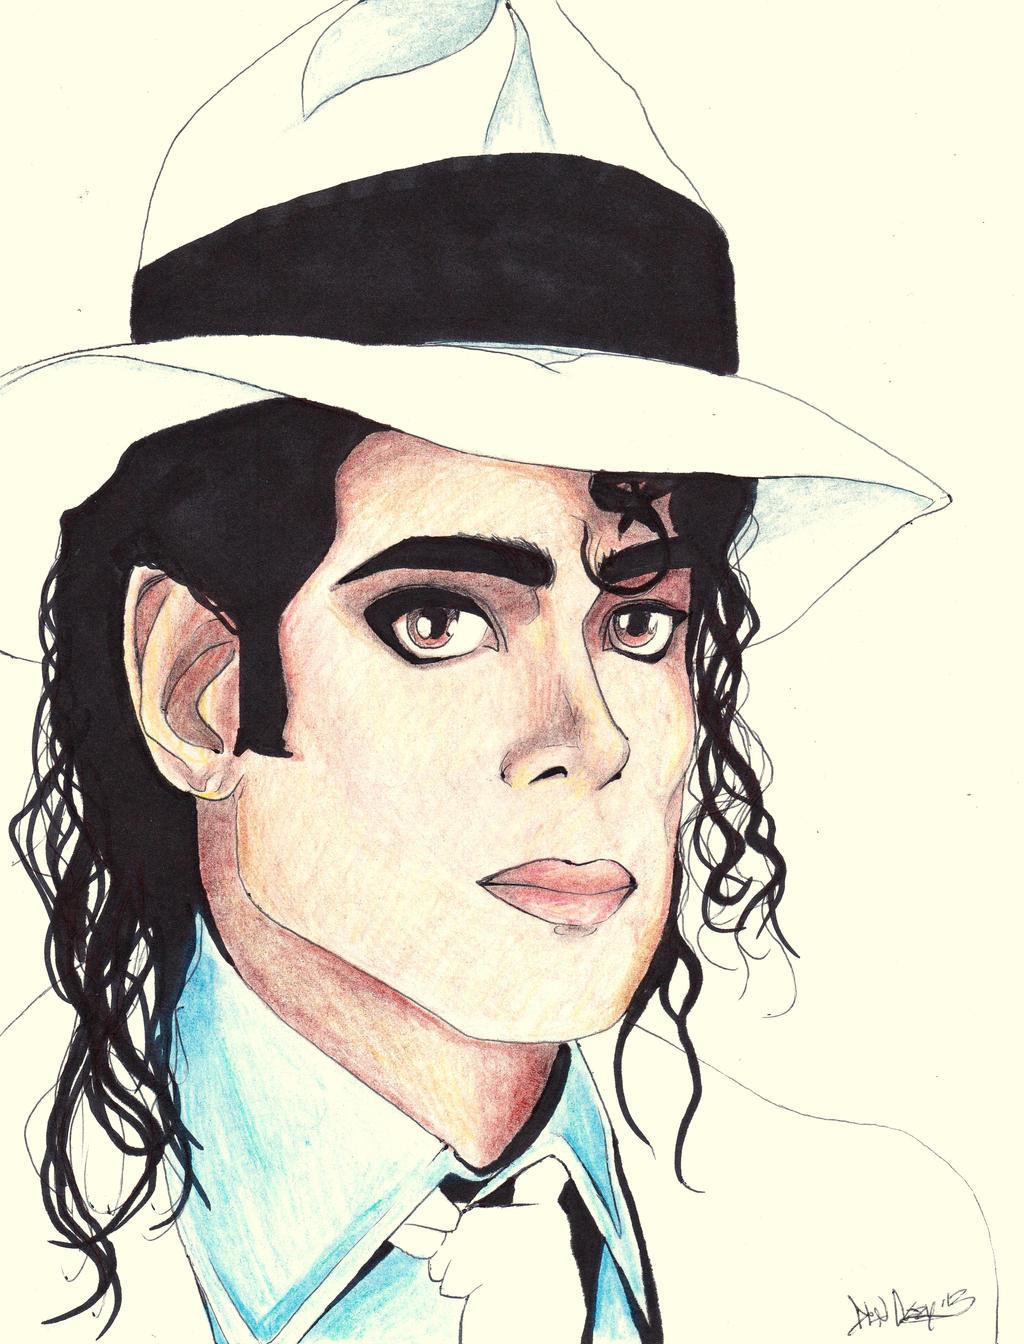 Michael Jackson Smooth Criminal Wallpaper 77510 Radiotimes